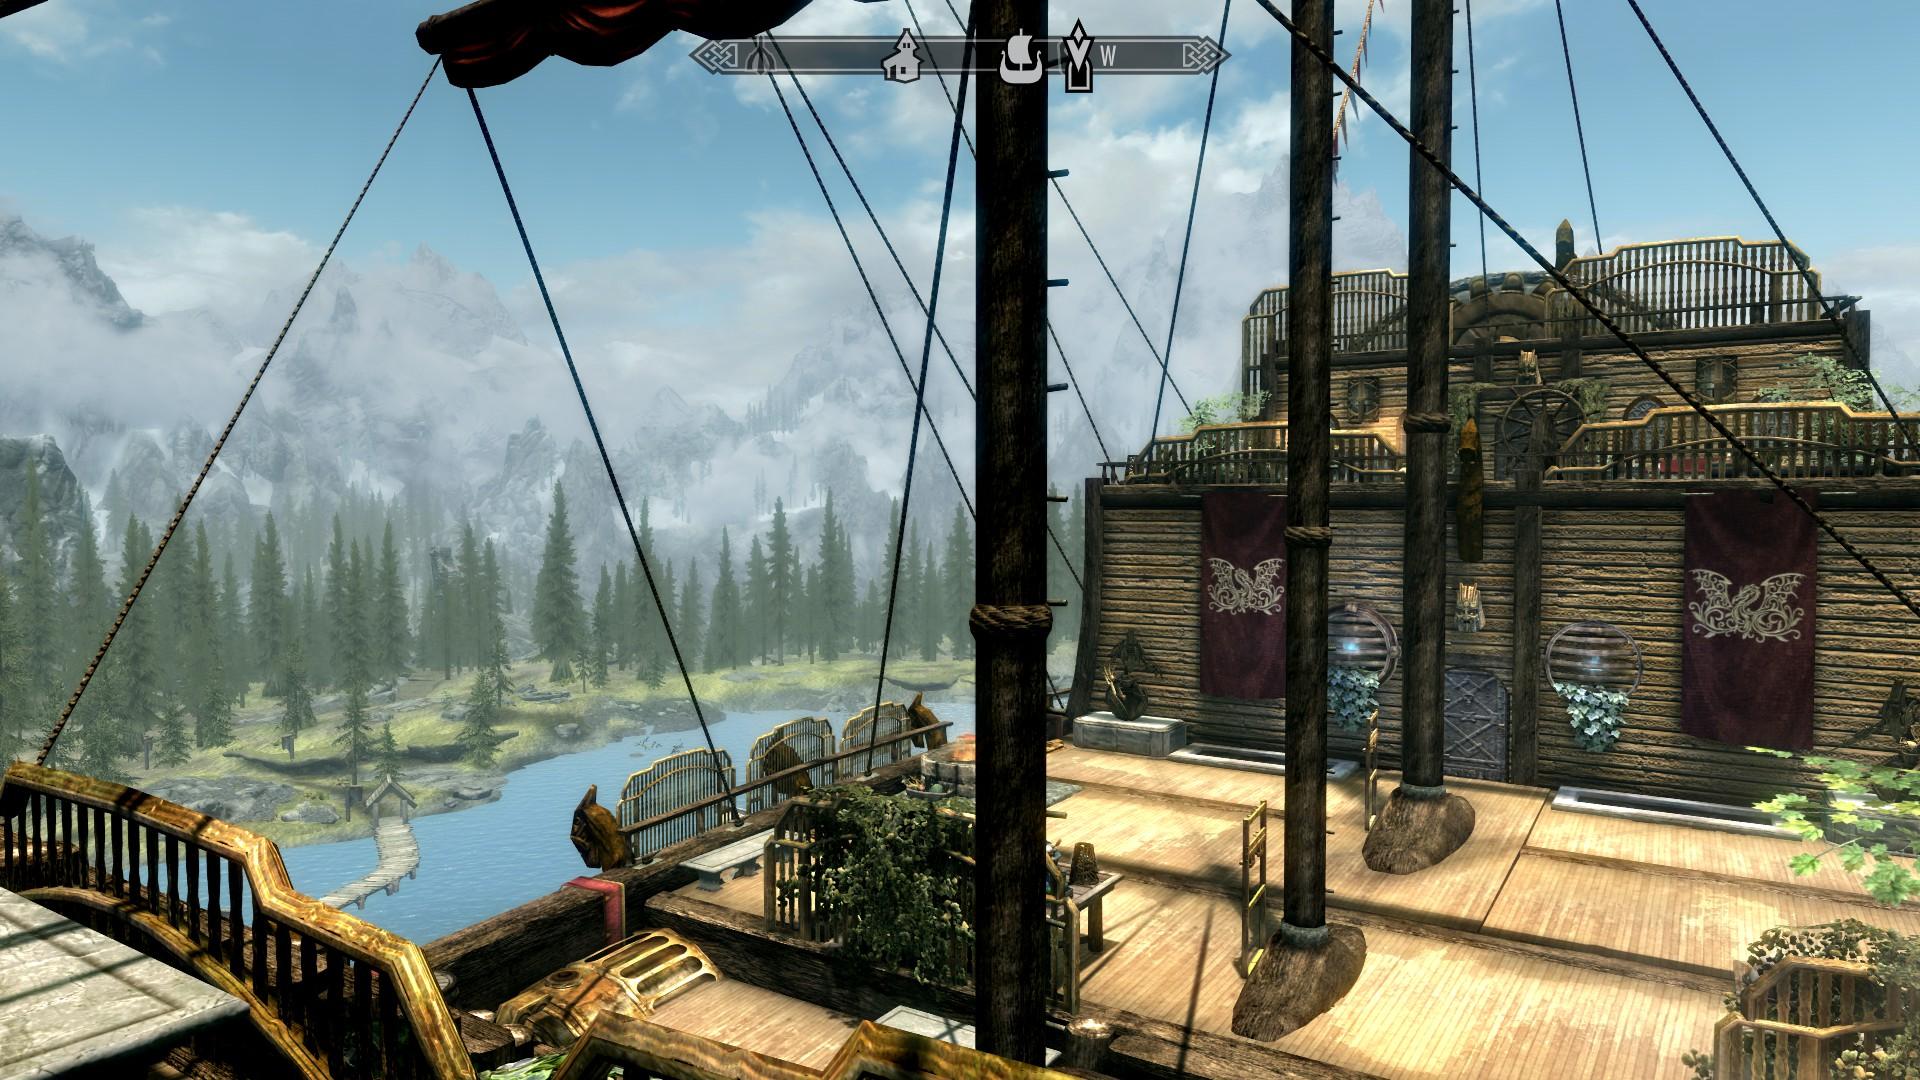 Skyrim Special Edition mod - Asteria Dwemer Airship